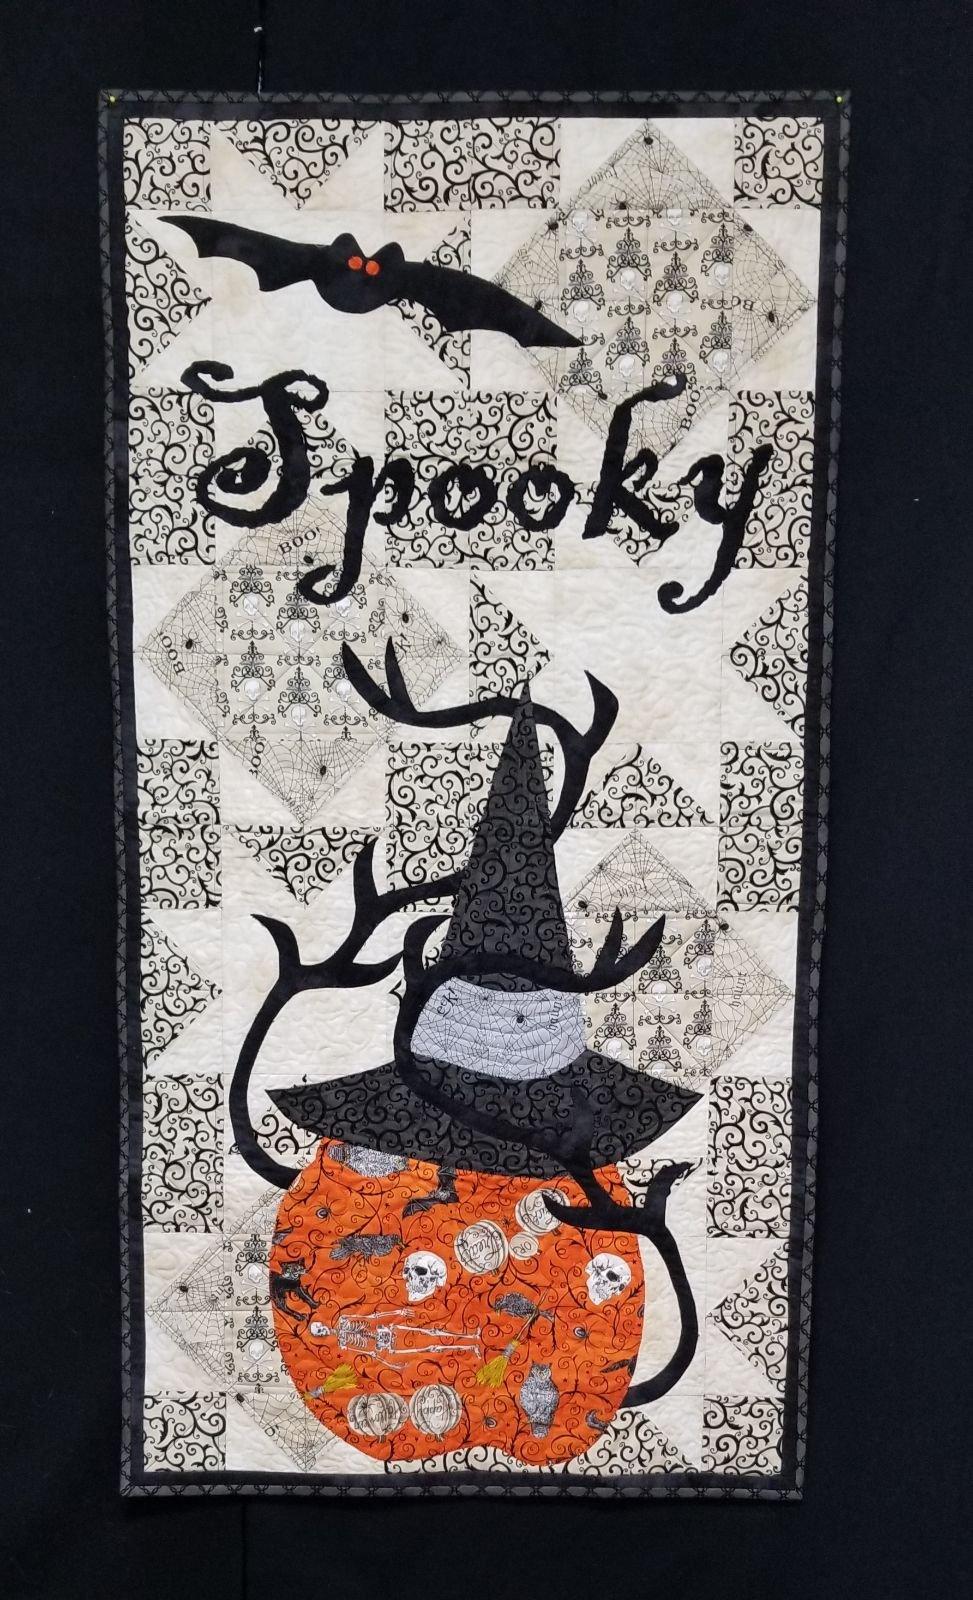 Spooky Time Kit